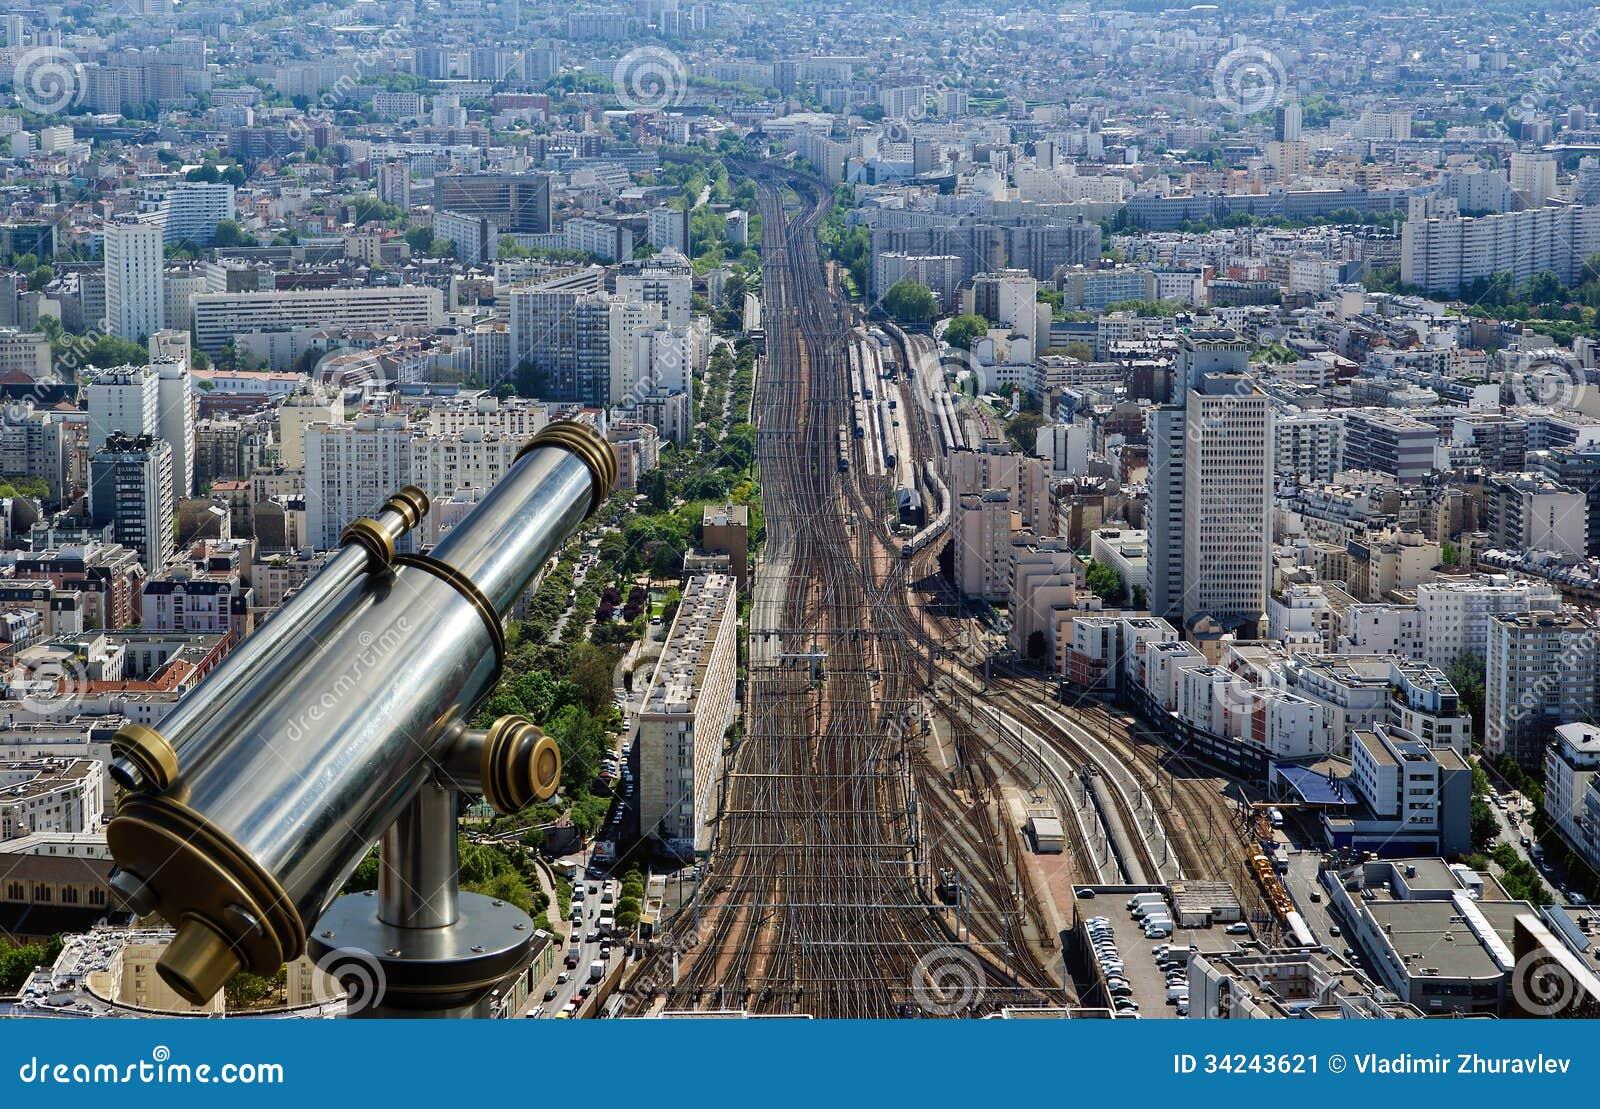 Telescope Viewer And City Skyline At Daytime Paris